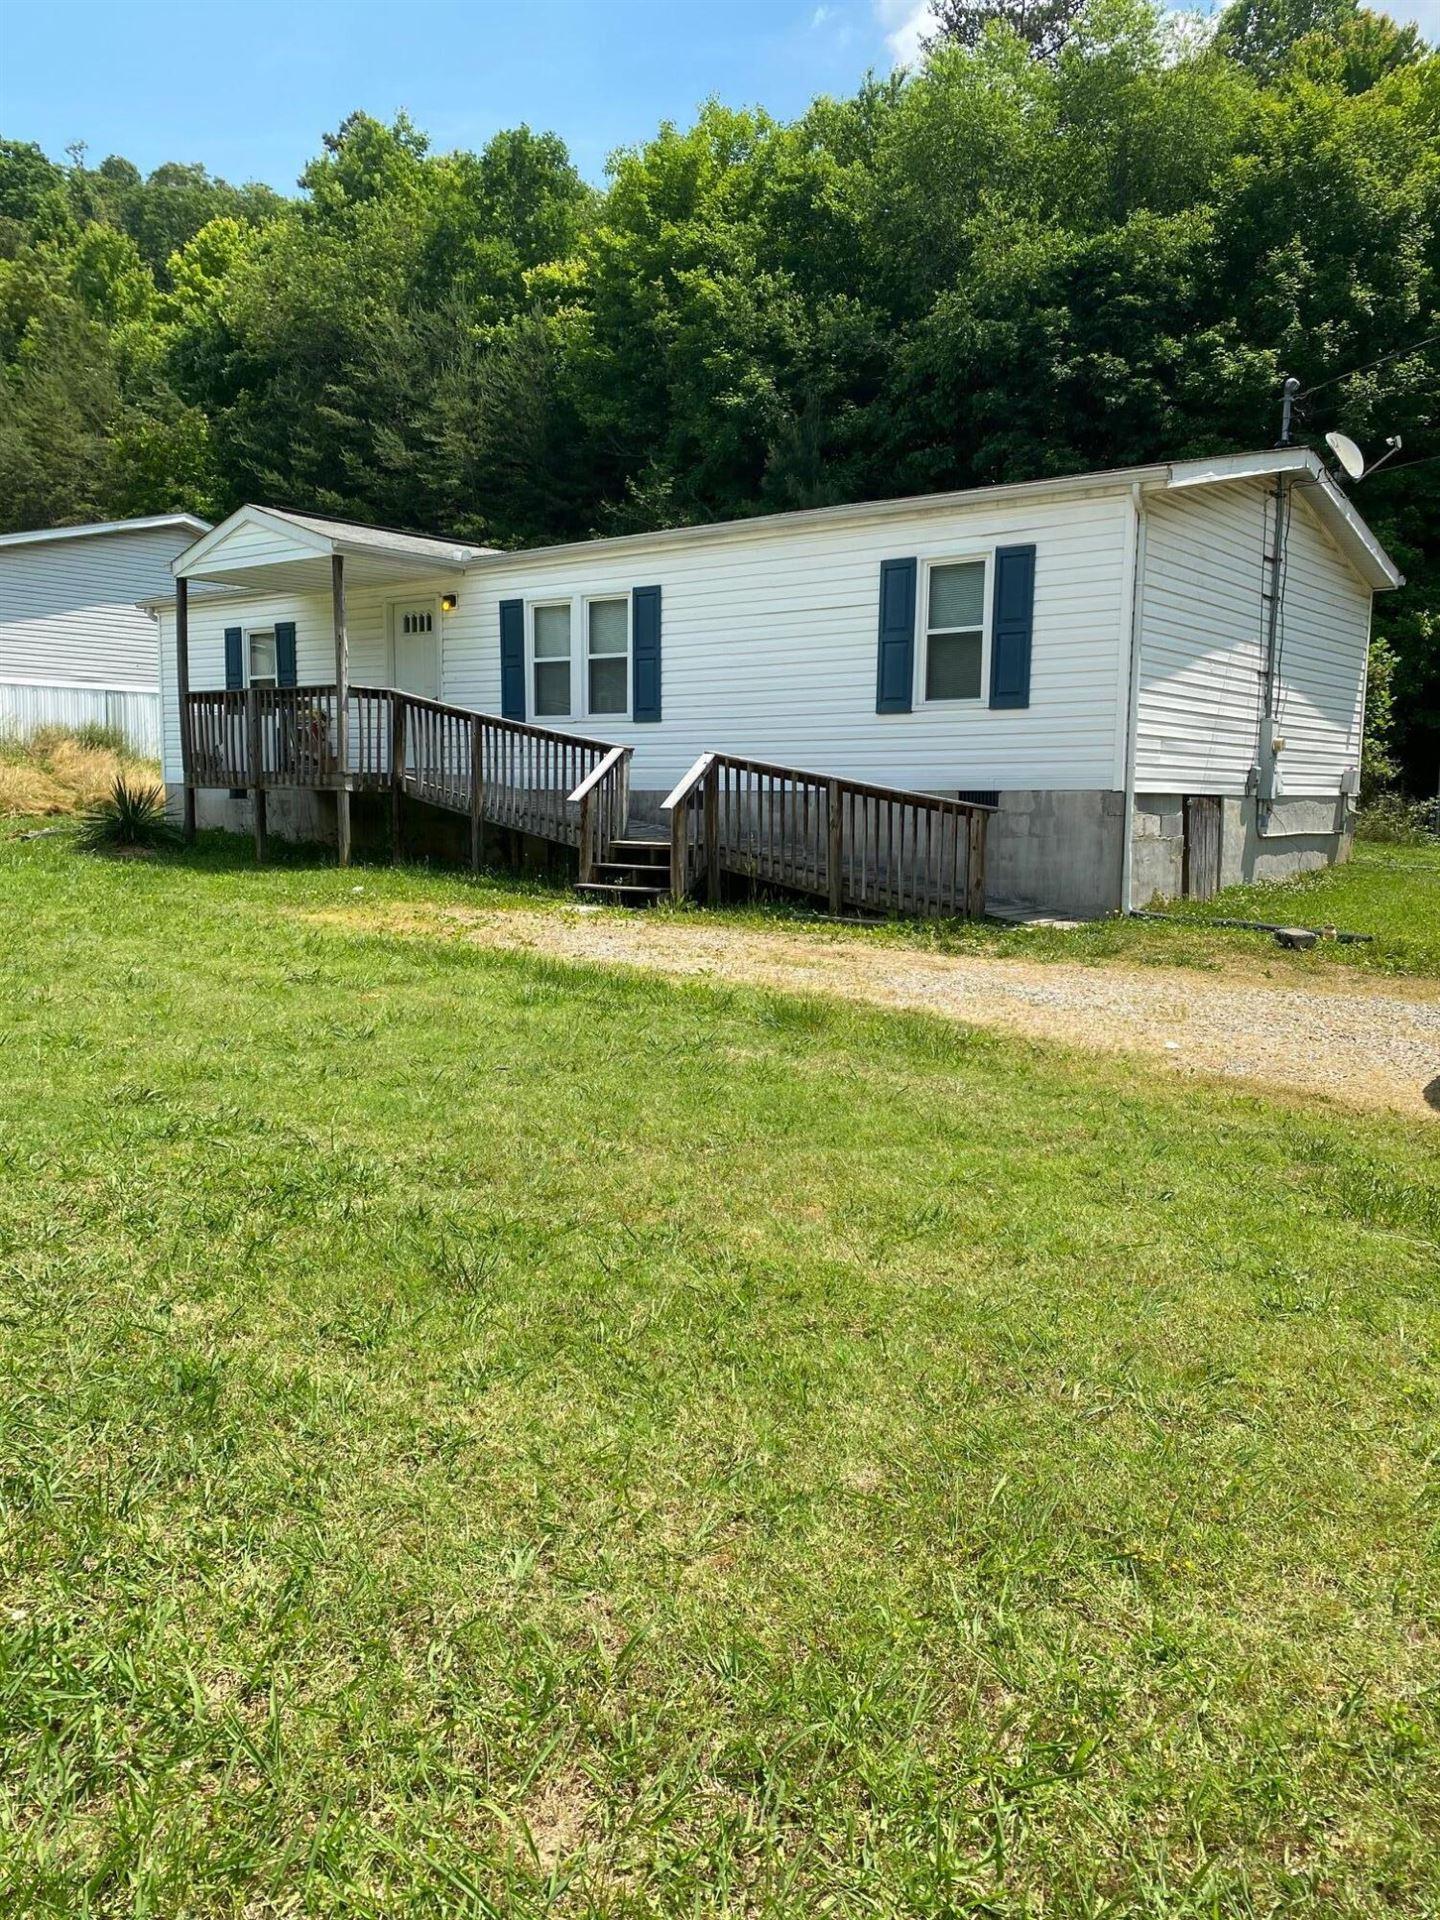 Photo of 100 Red Hawk Lane, Powell, TN 37849 (MLS # 1151349)